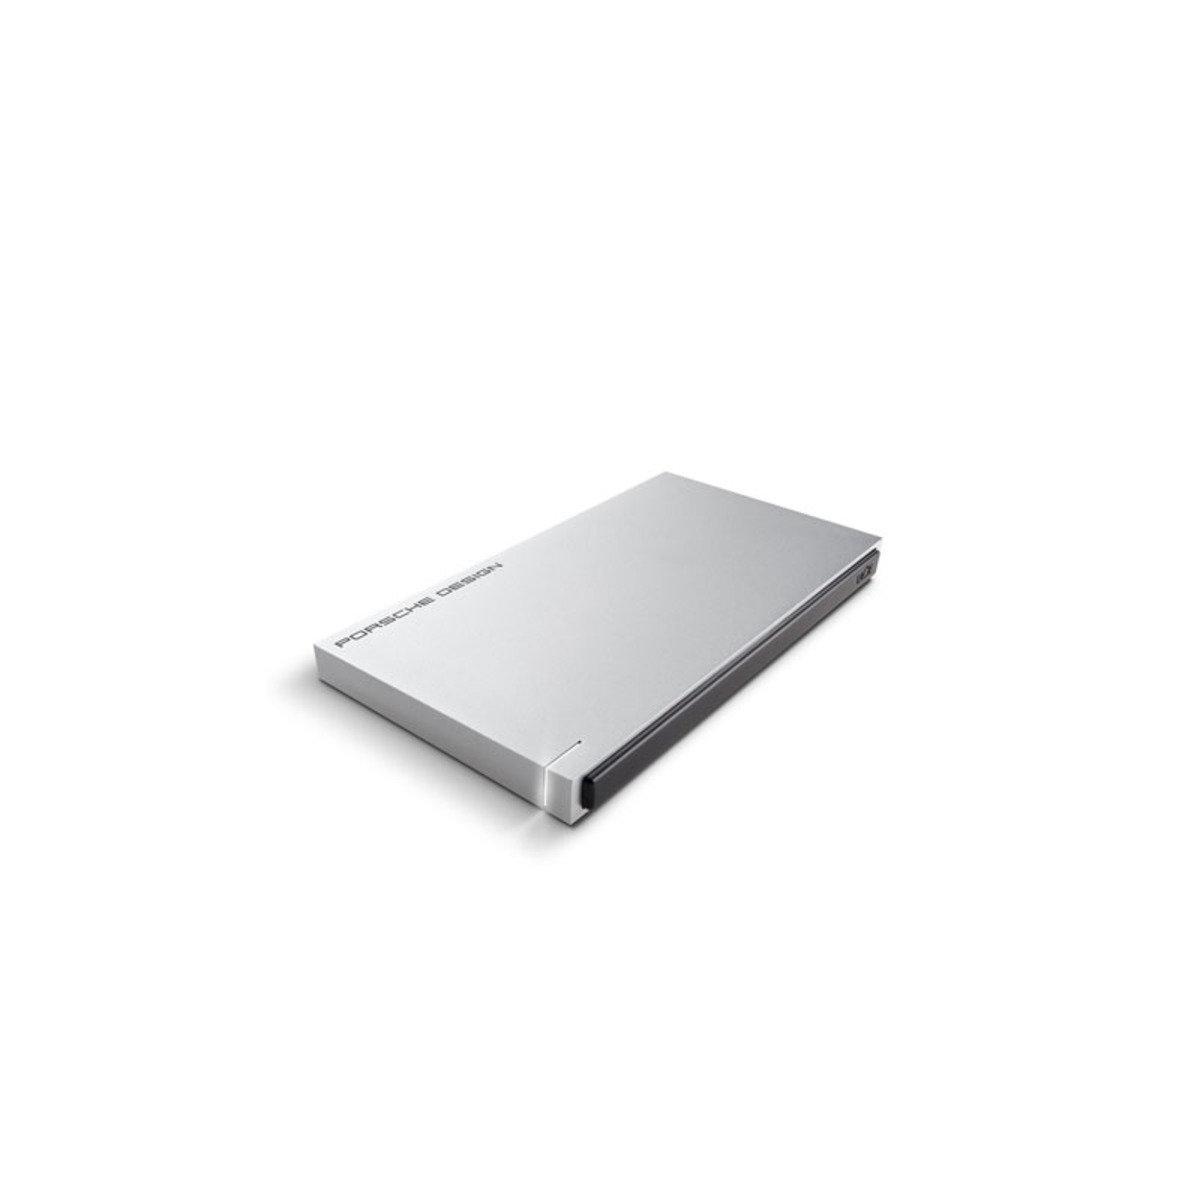 Porsche Design Silm Mobile 120GB SSD USB3.0 外置硬碟 9000342